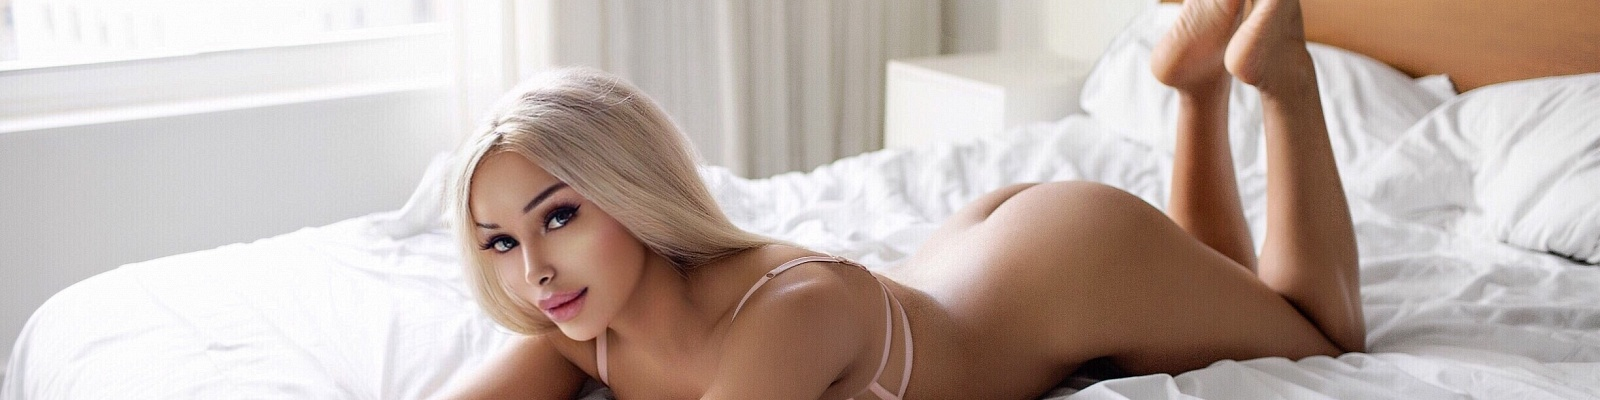 Hot asian girl fucked porn tube